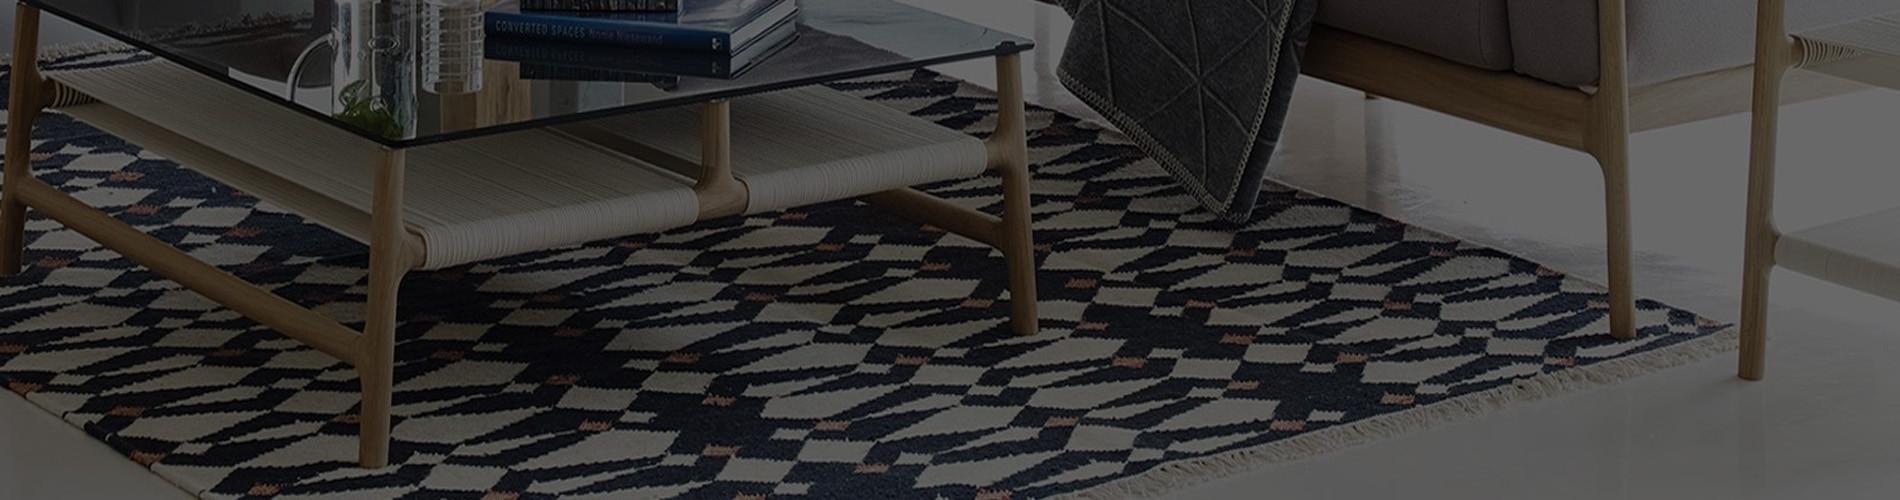 Modern Designer Carpet Rugs | Hall Bedroom Dining and Living Room